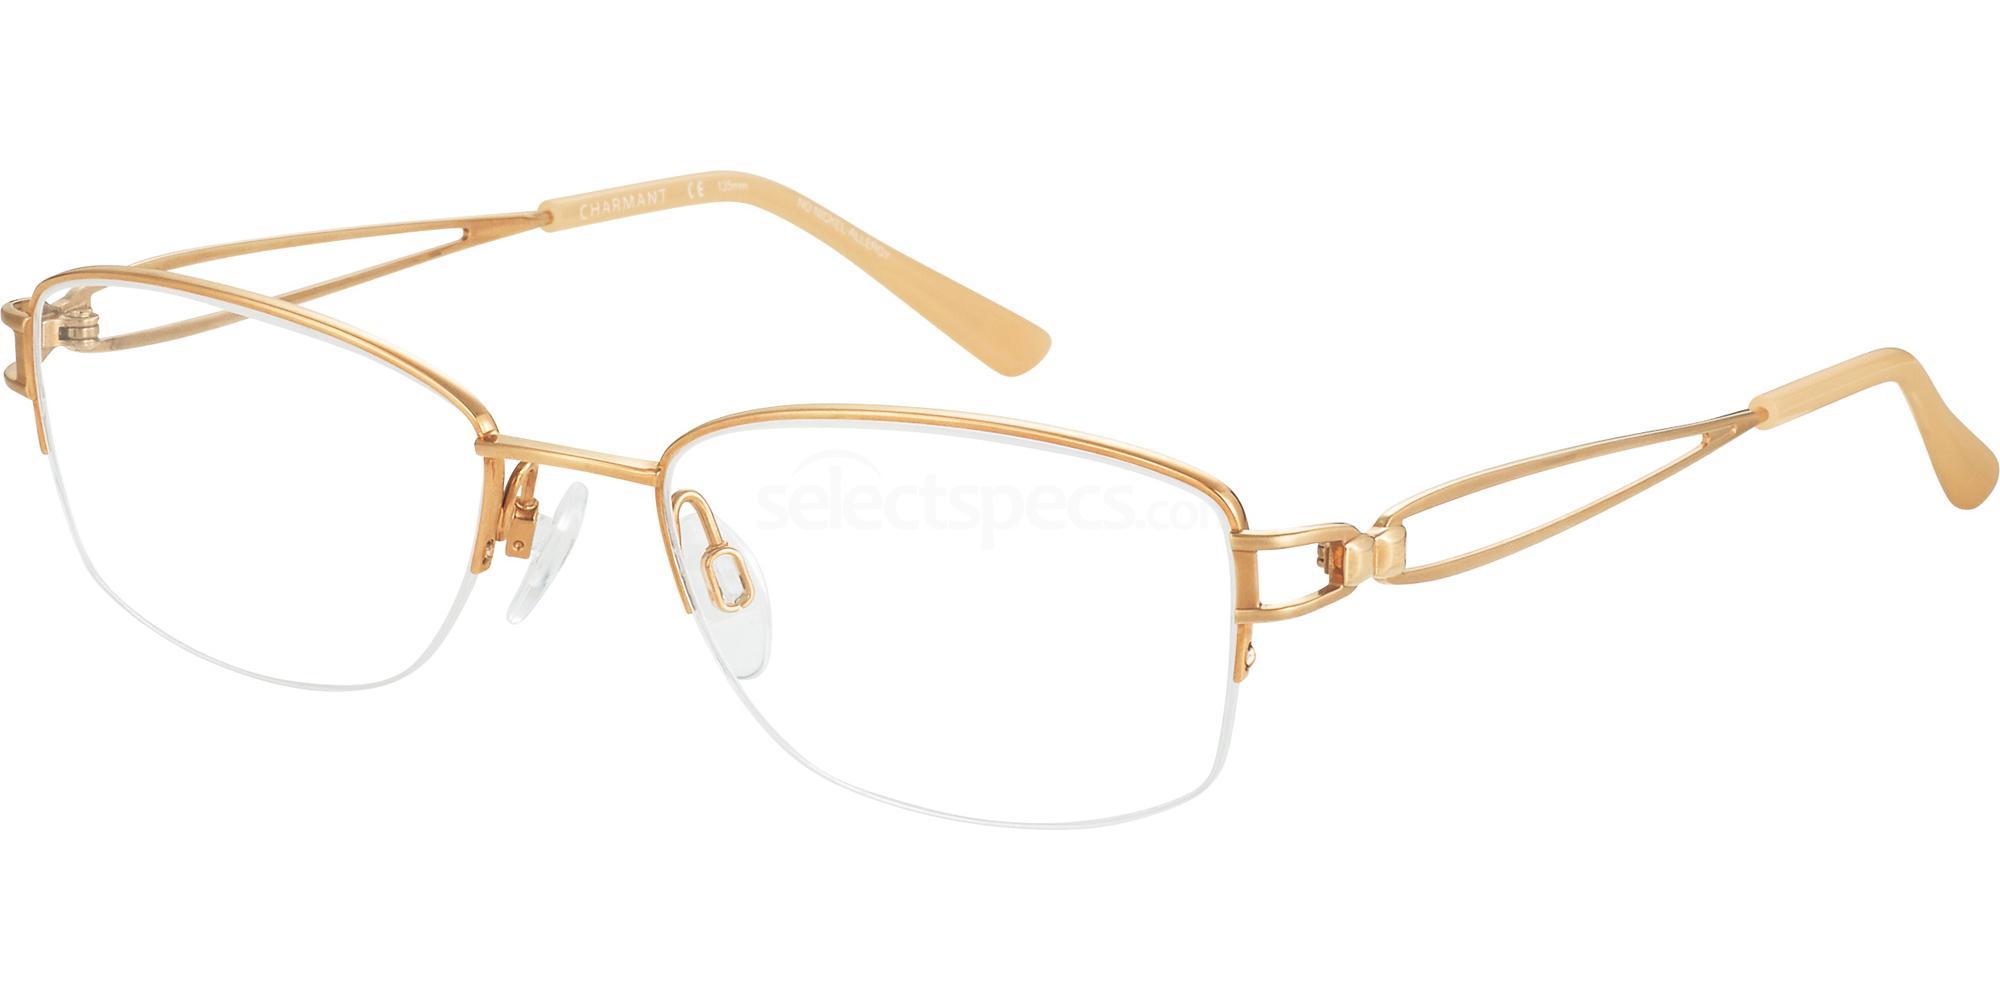 GP CH12131 Glasses, Charmant Titanium Perfection